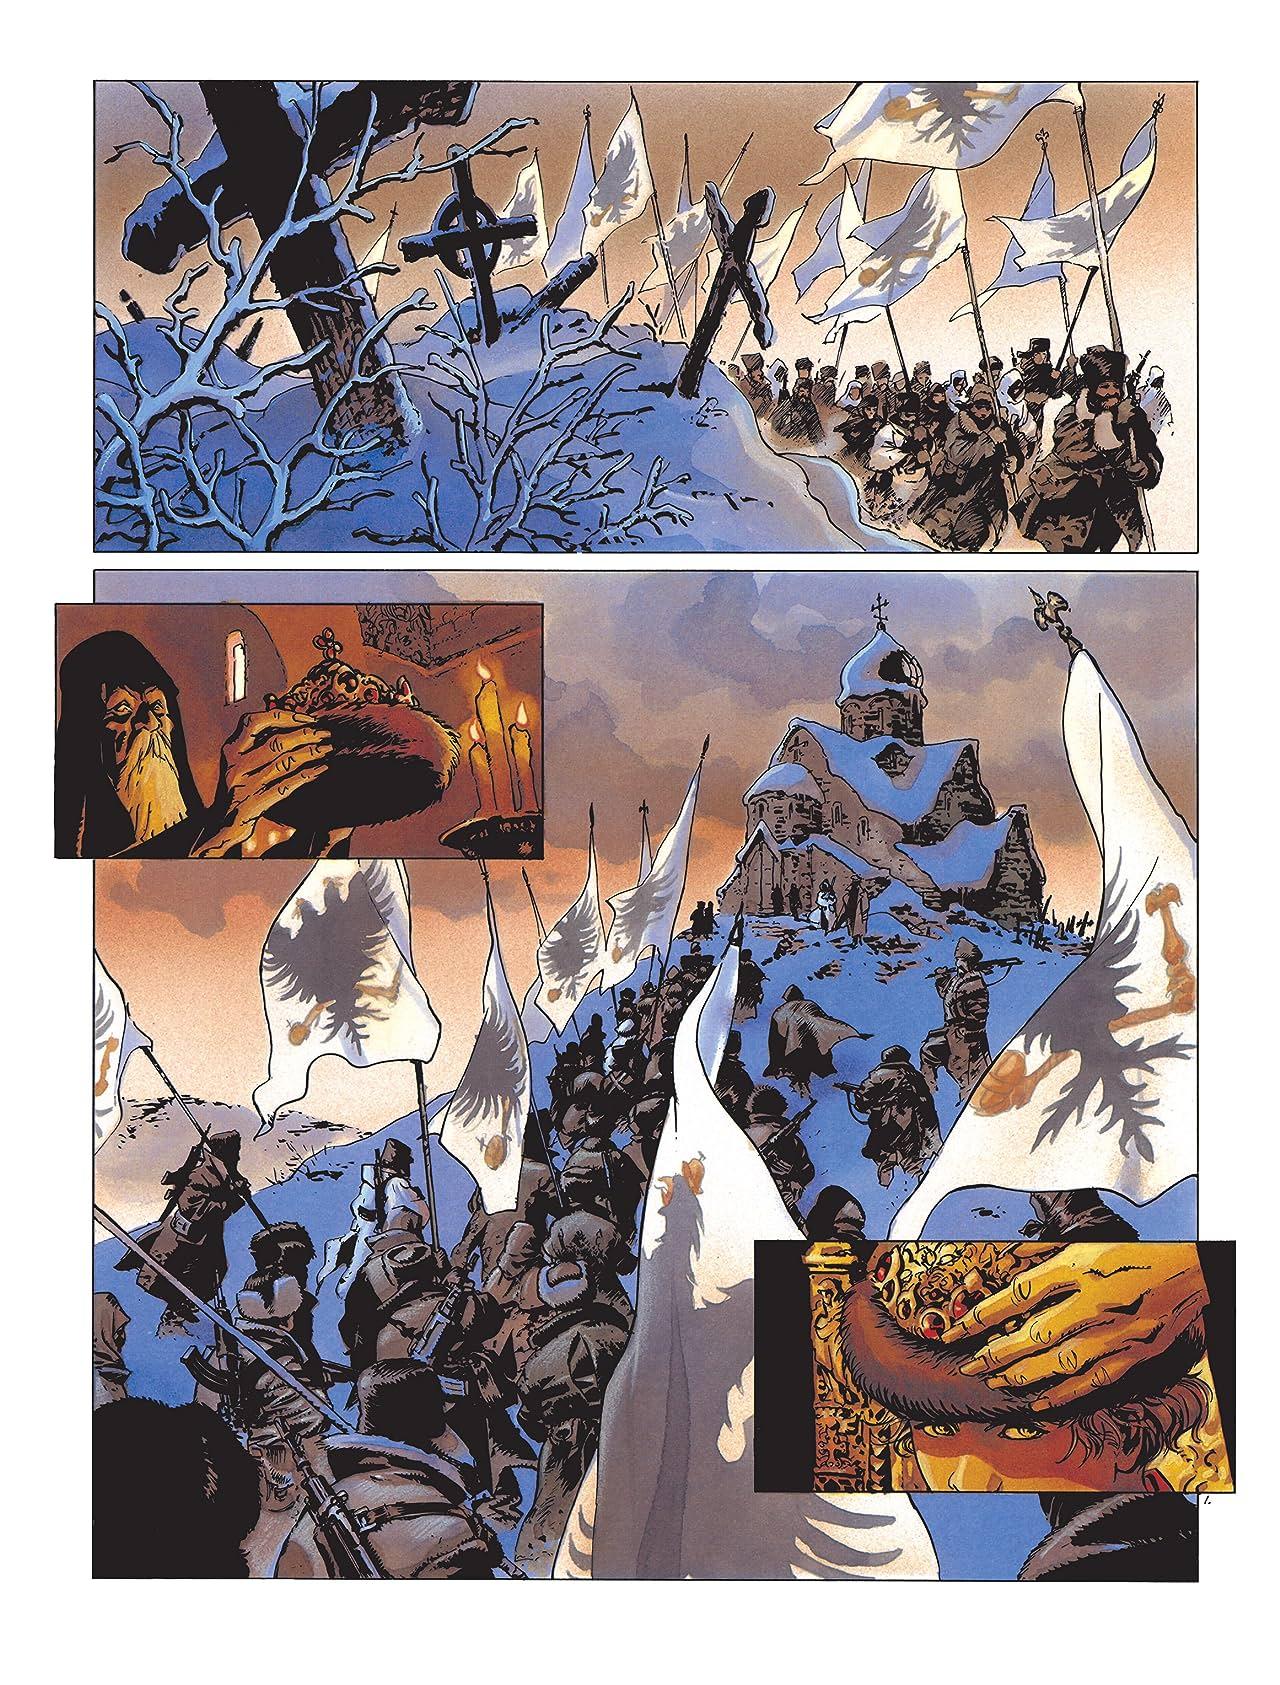 Gipsy Vol. 3: Le Jour du Tsar